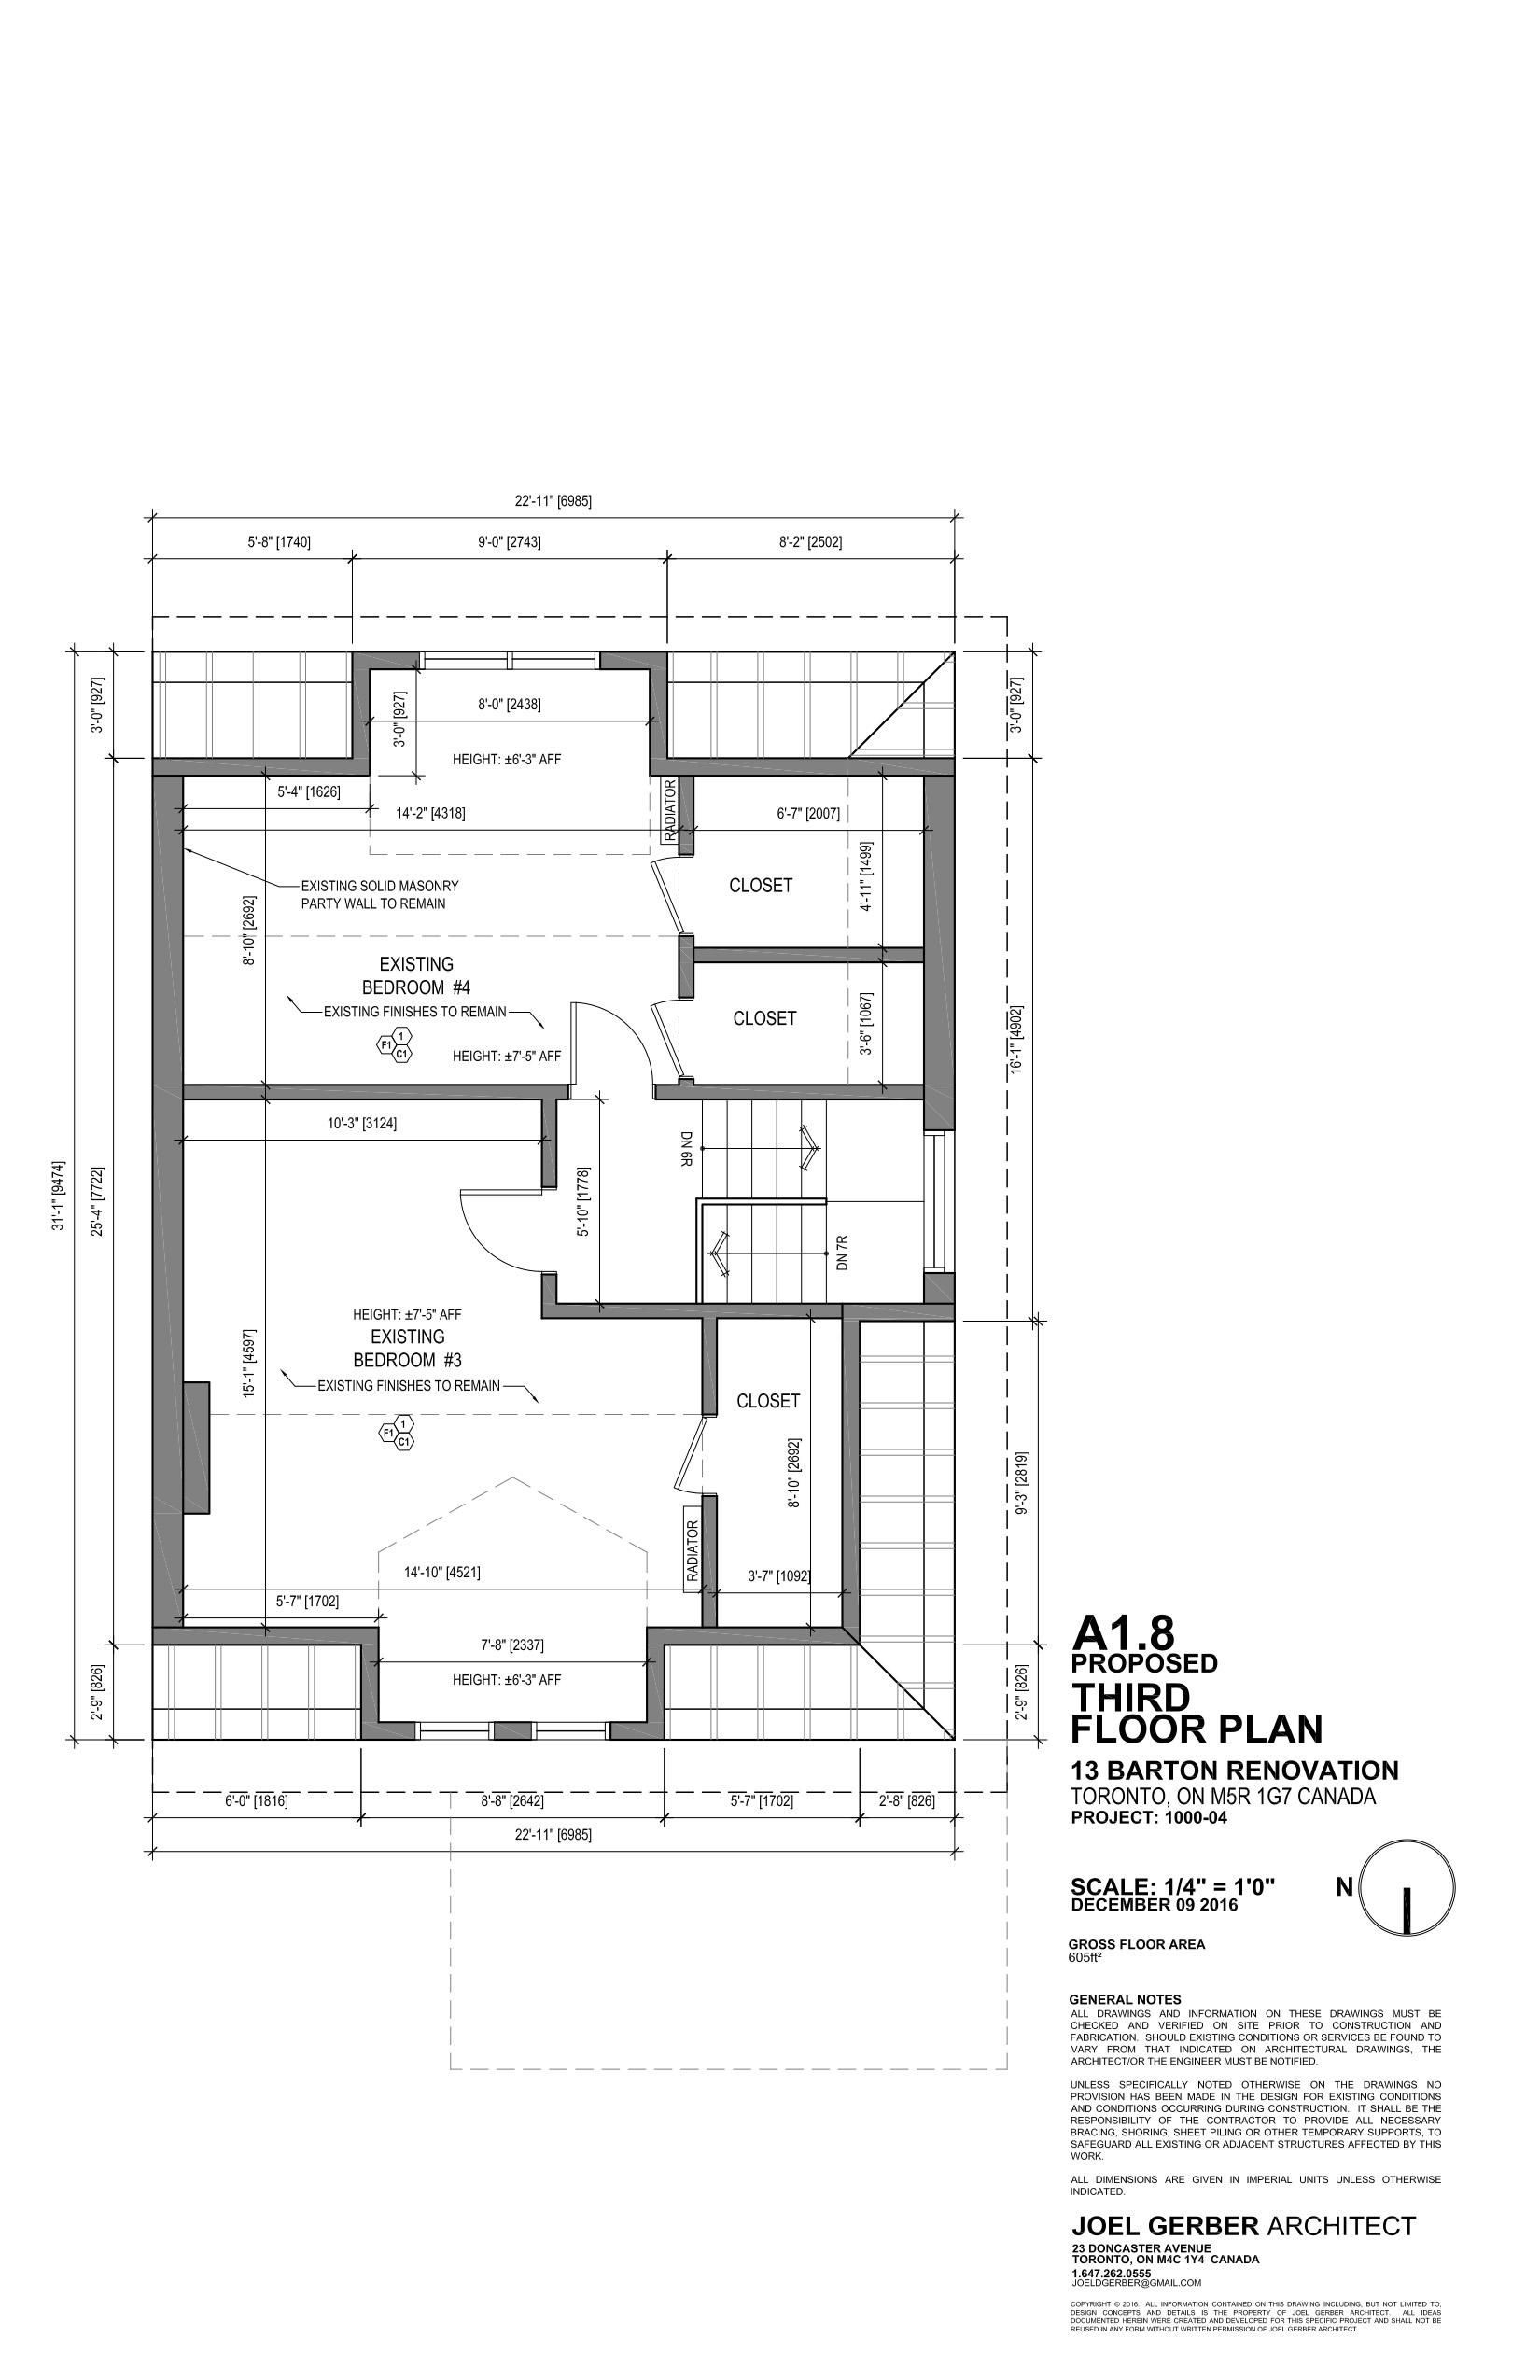 Drawing, Third Floor